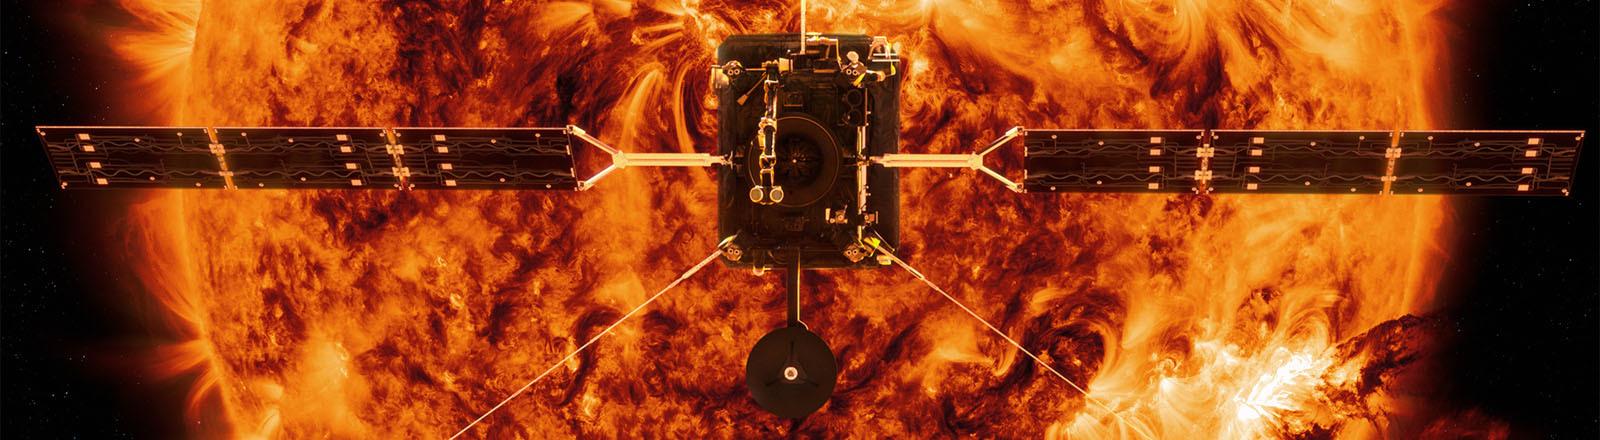 Die Sonnensonde Solar Orbiter.